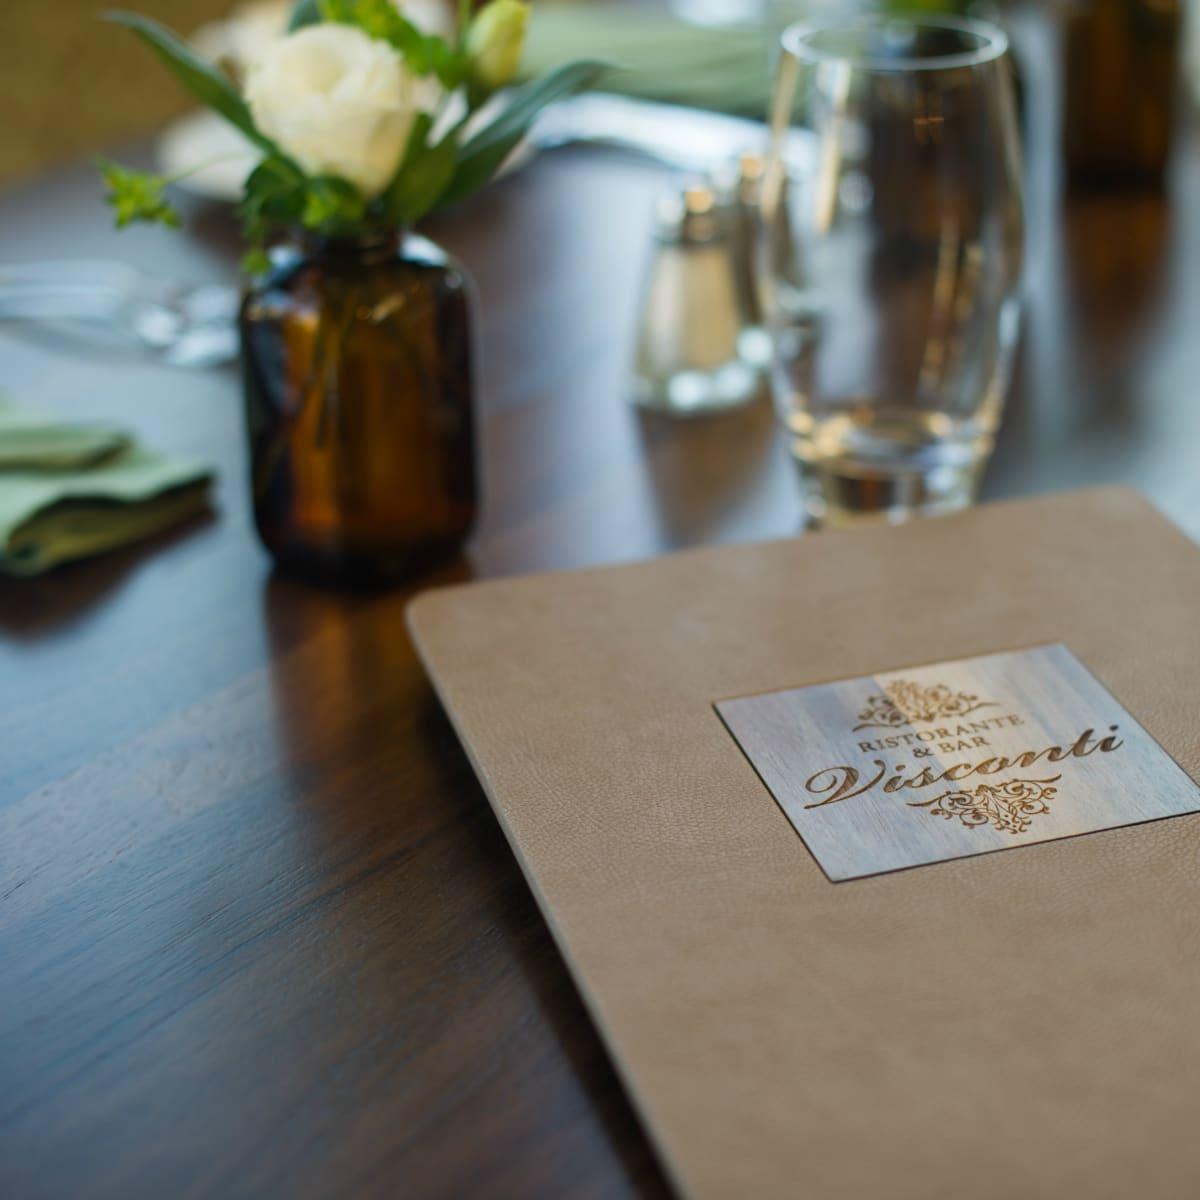 Hotel Granduca Austin opening 2015 restaurant Ristorante Visconti menu